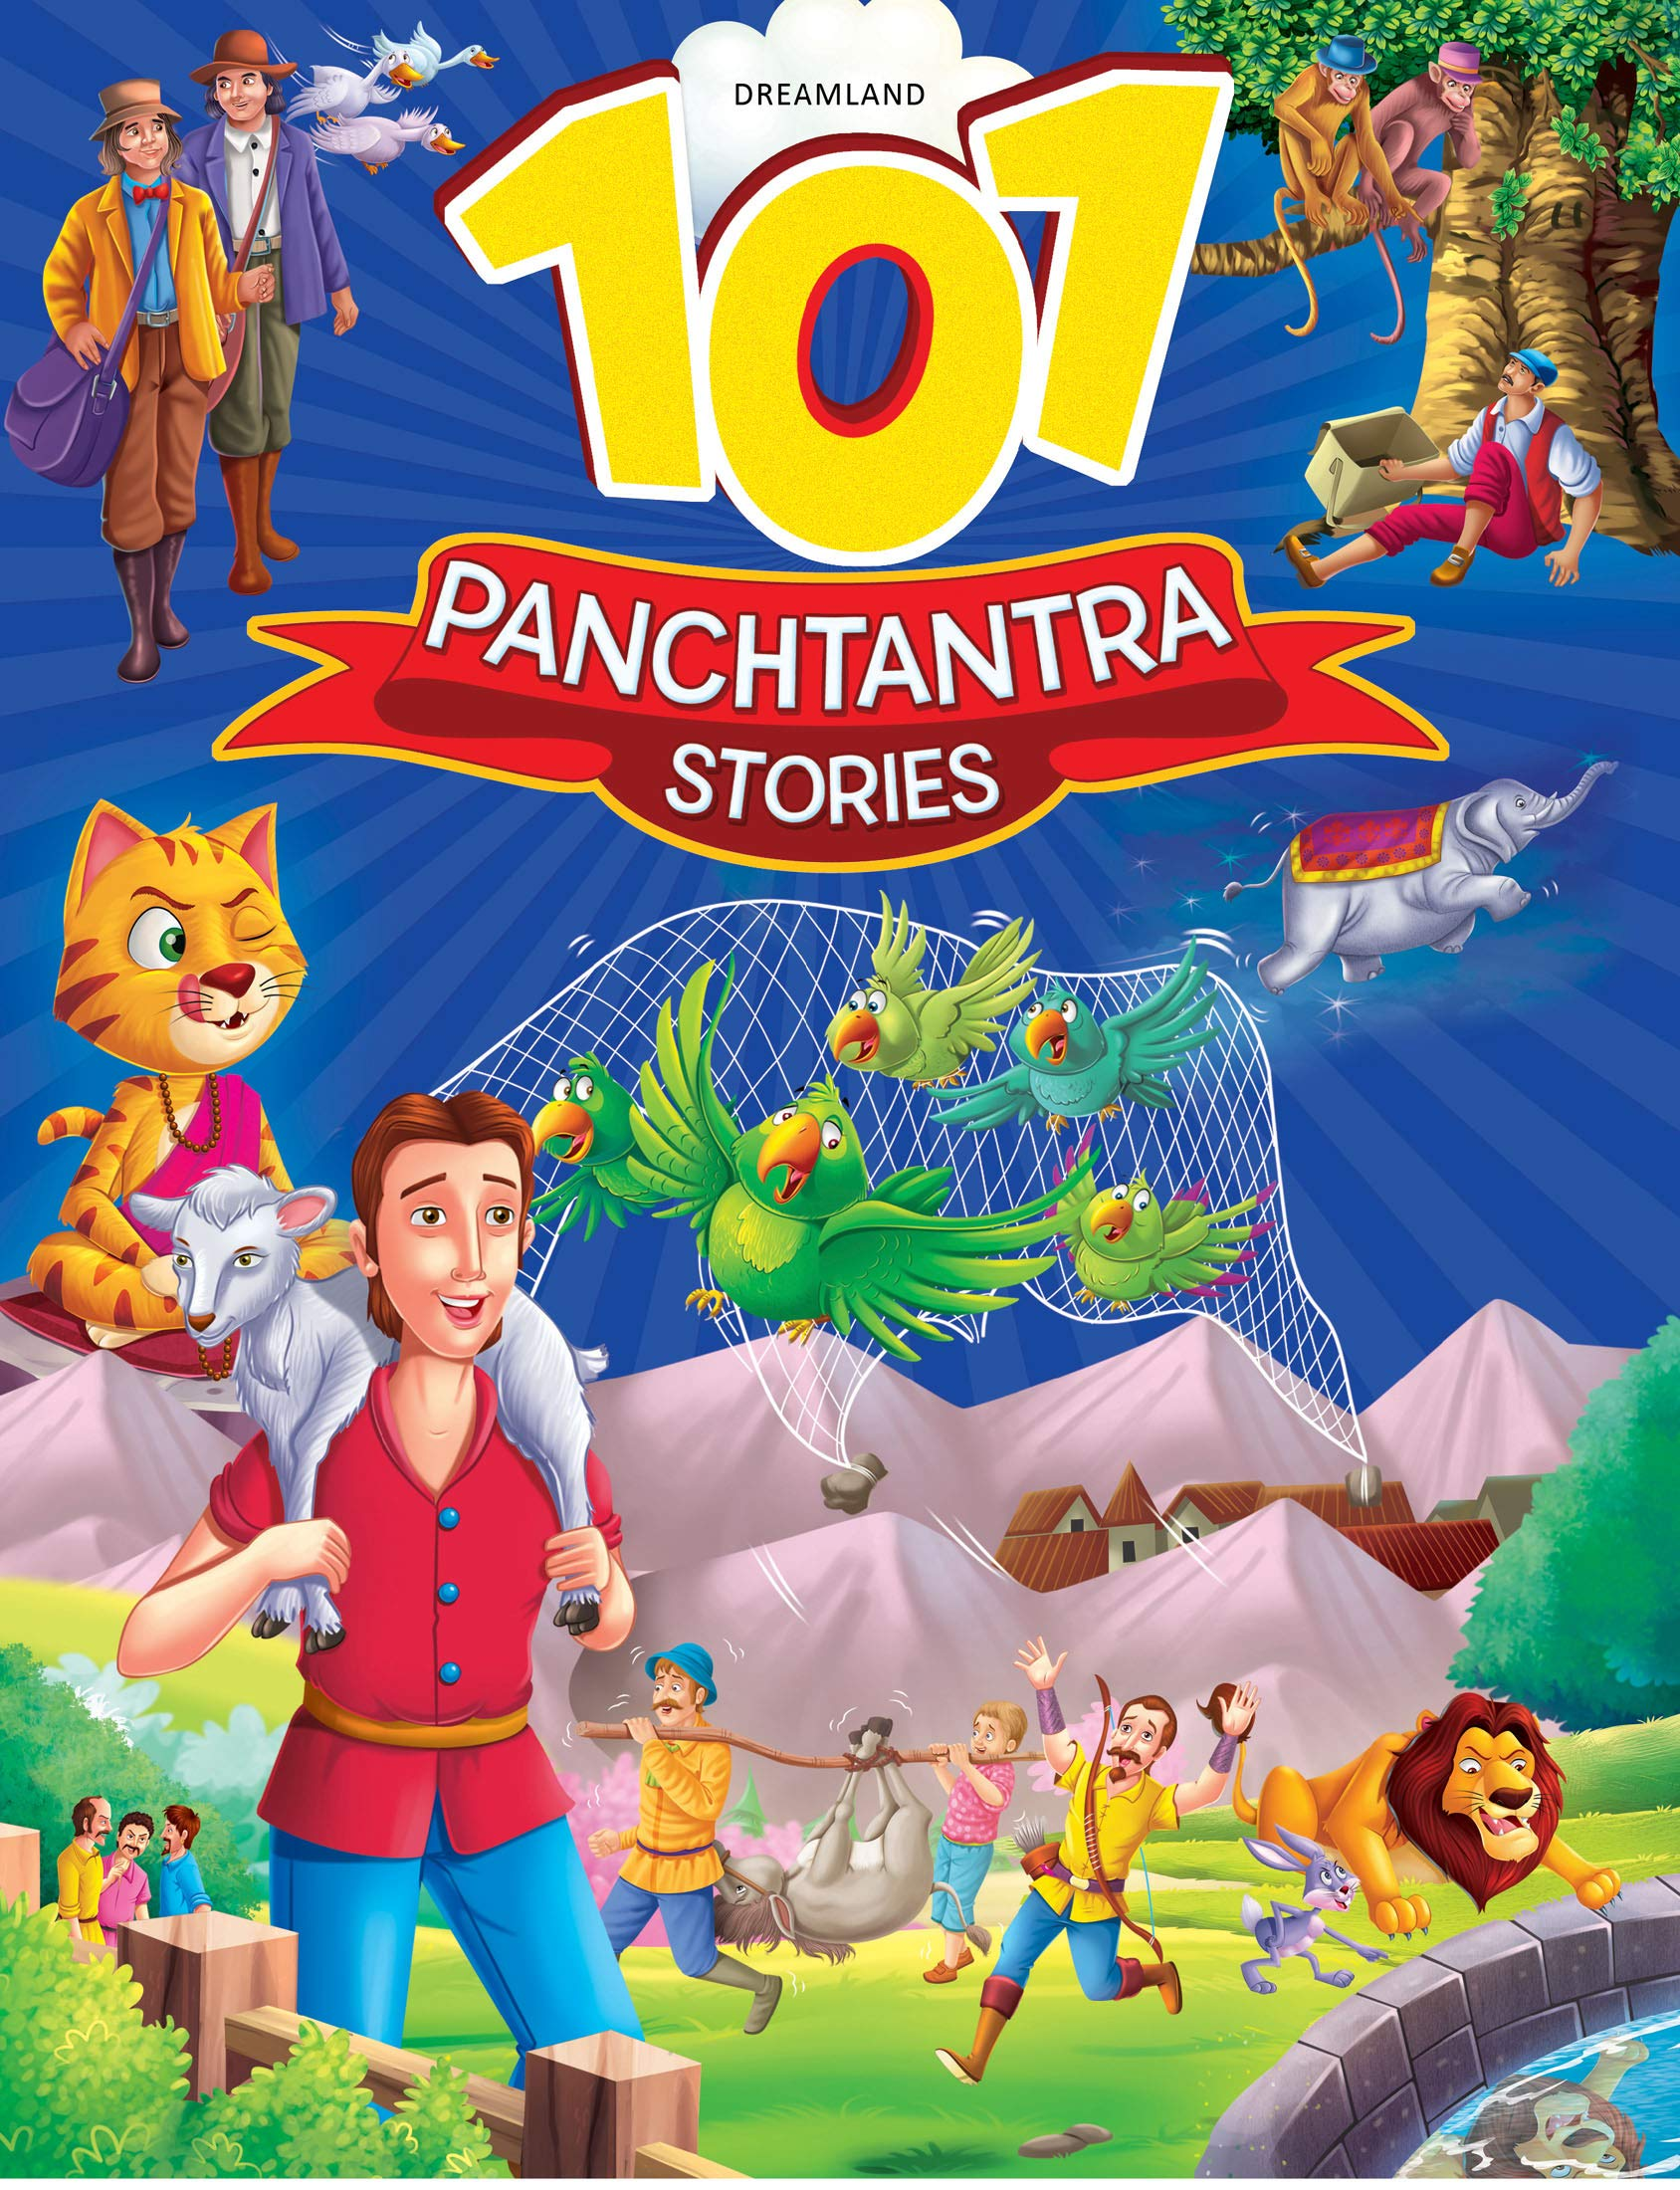 101 Panchatantra Stories (938797149X) Amazon Price History, Amazon Price Tracker